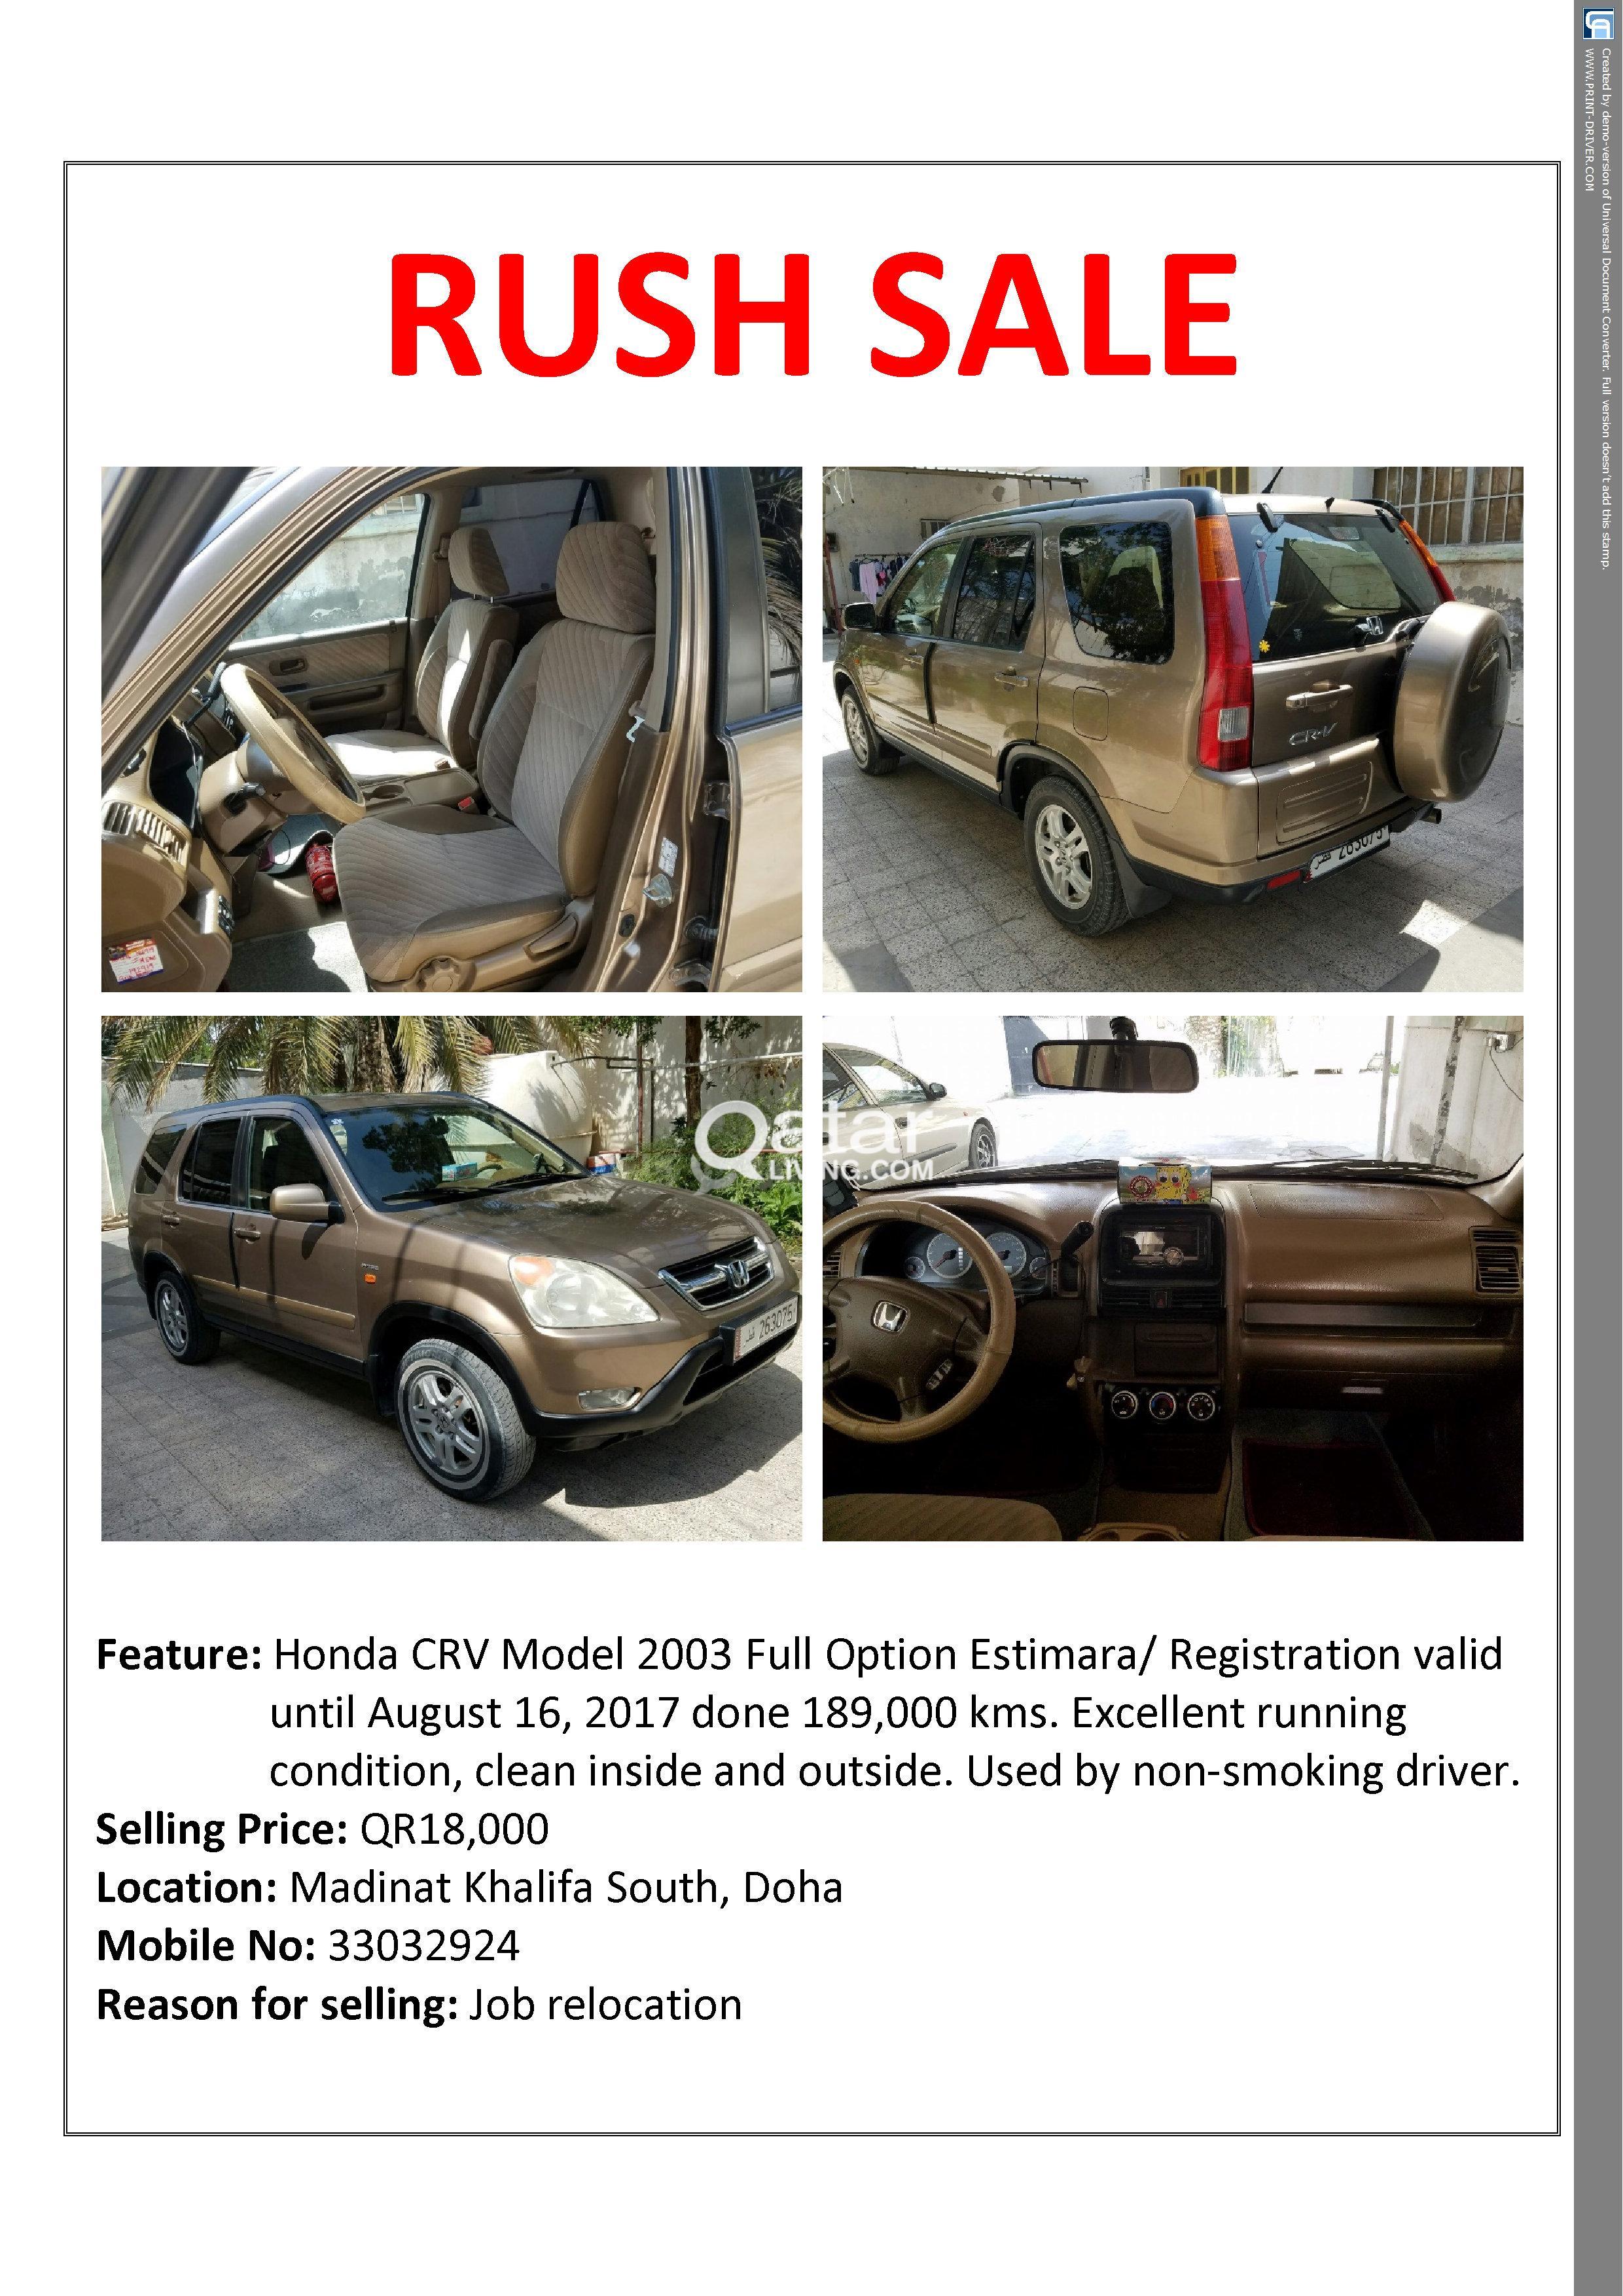 Honda CRV Model 2003 Full option | Qatar Living